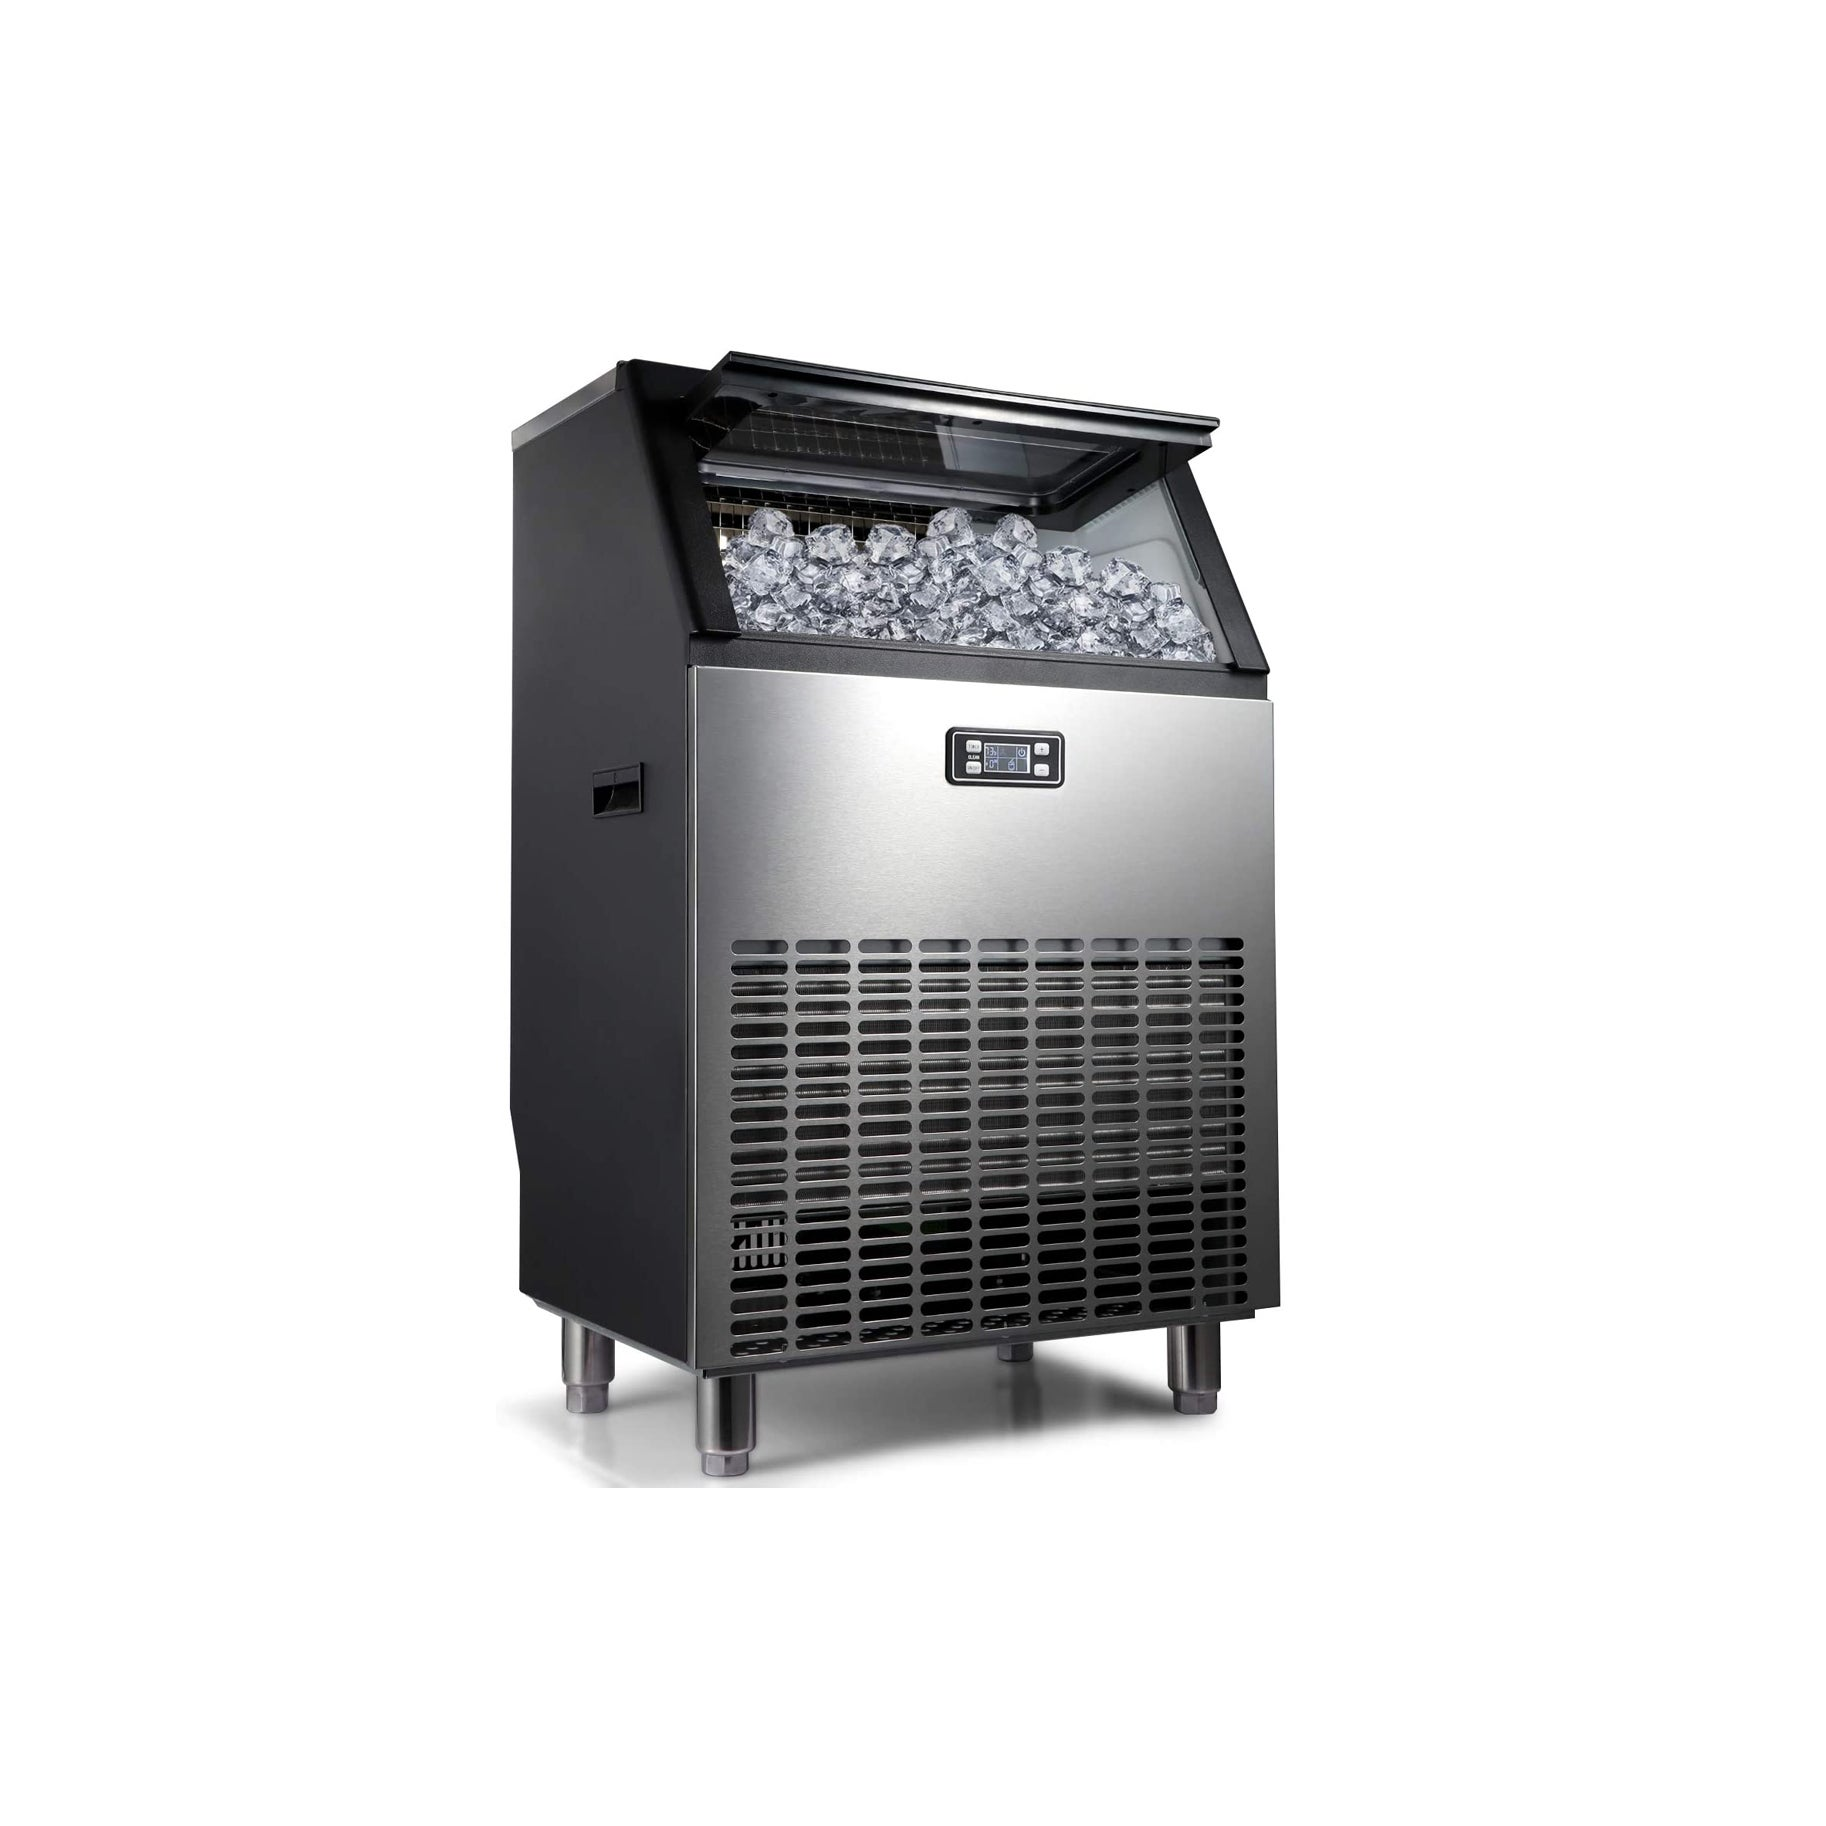 The Best Ice Maker Option: Northair Freestanding Commercial Ice Maker